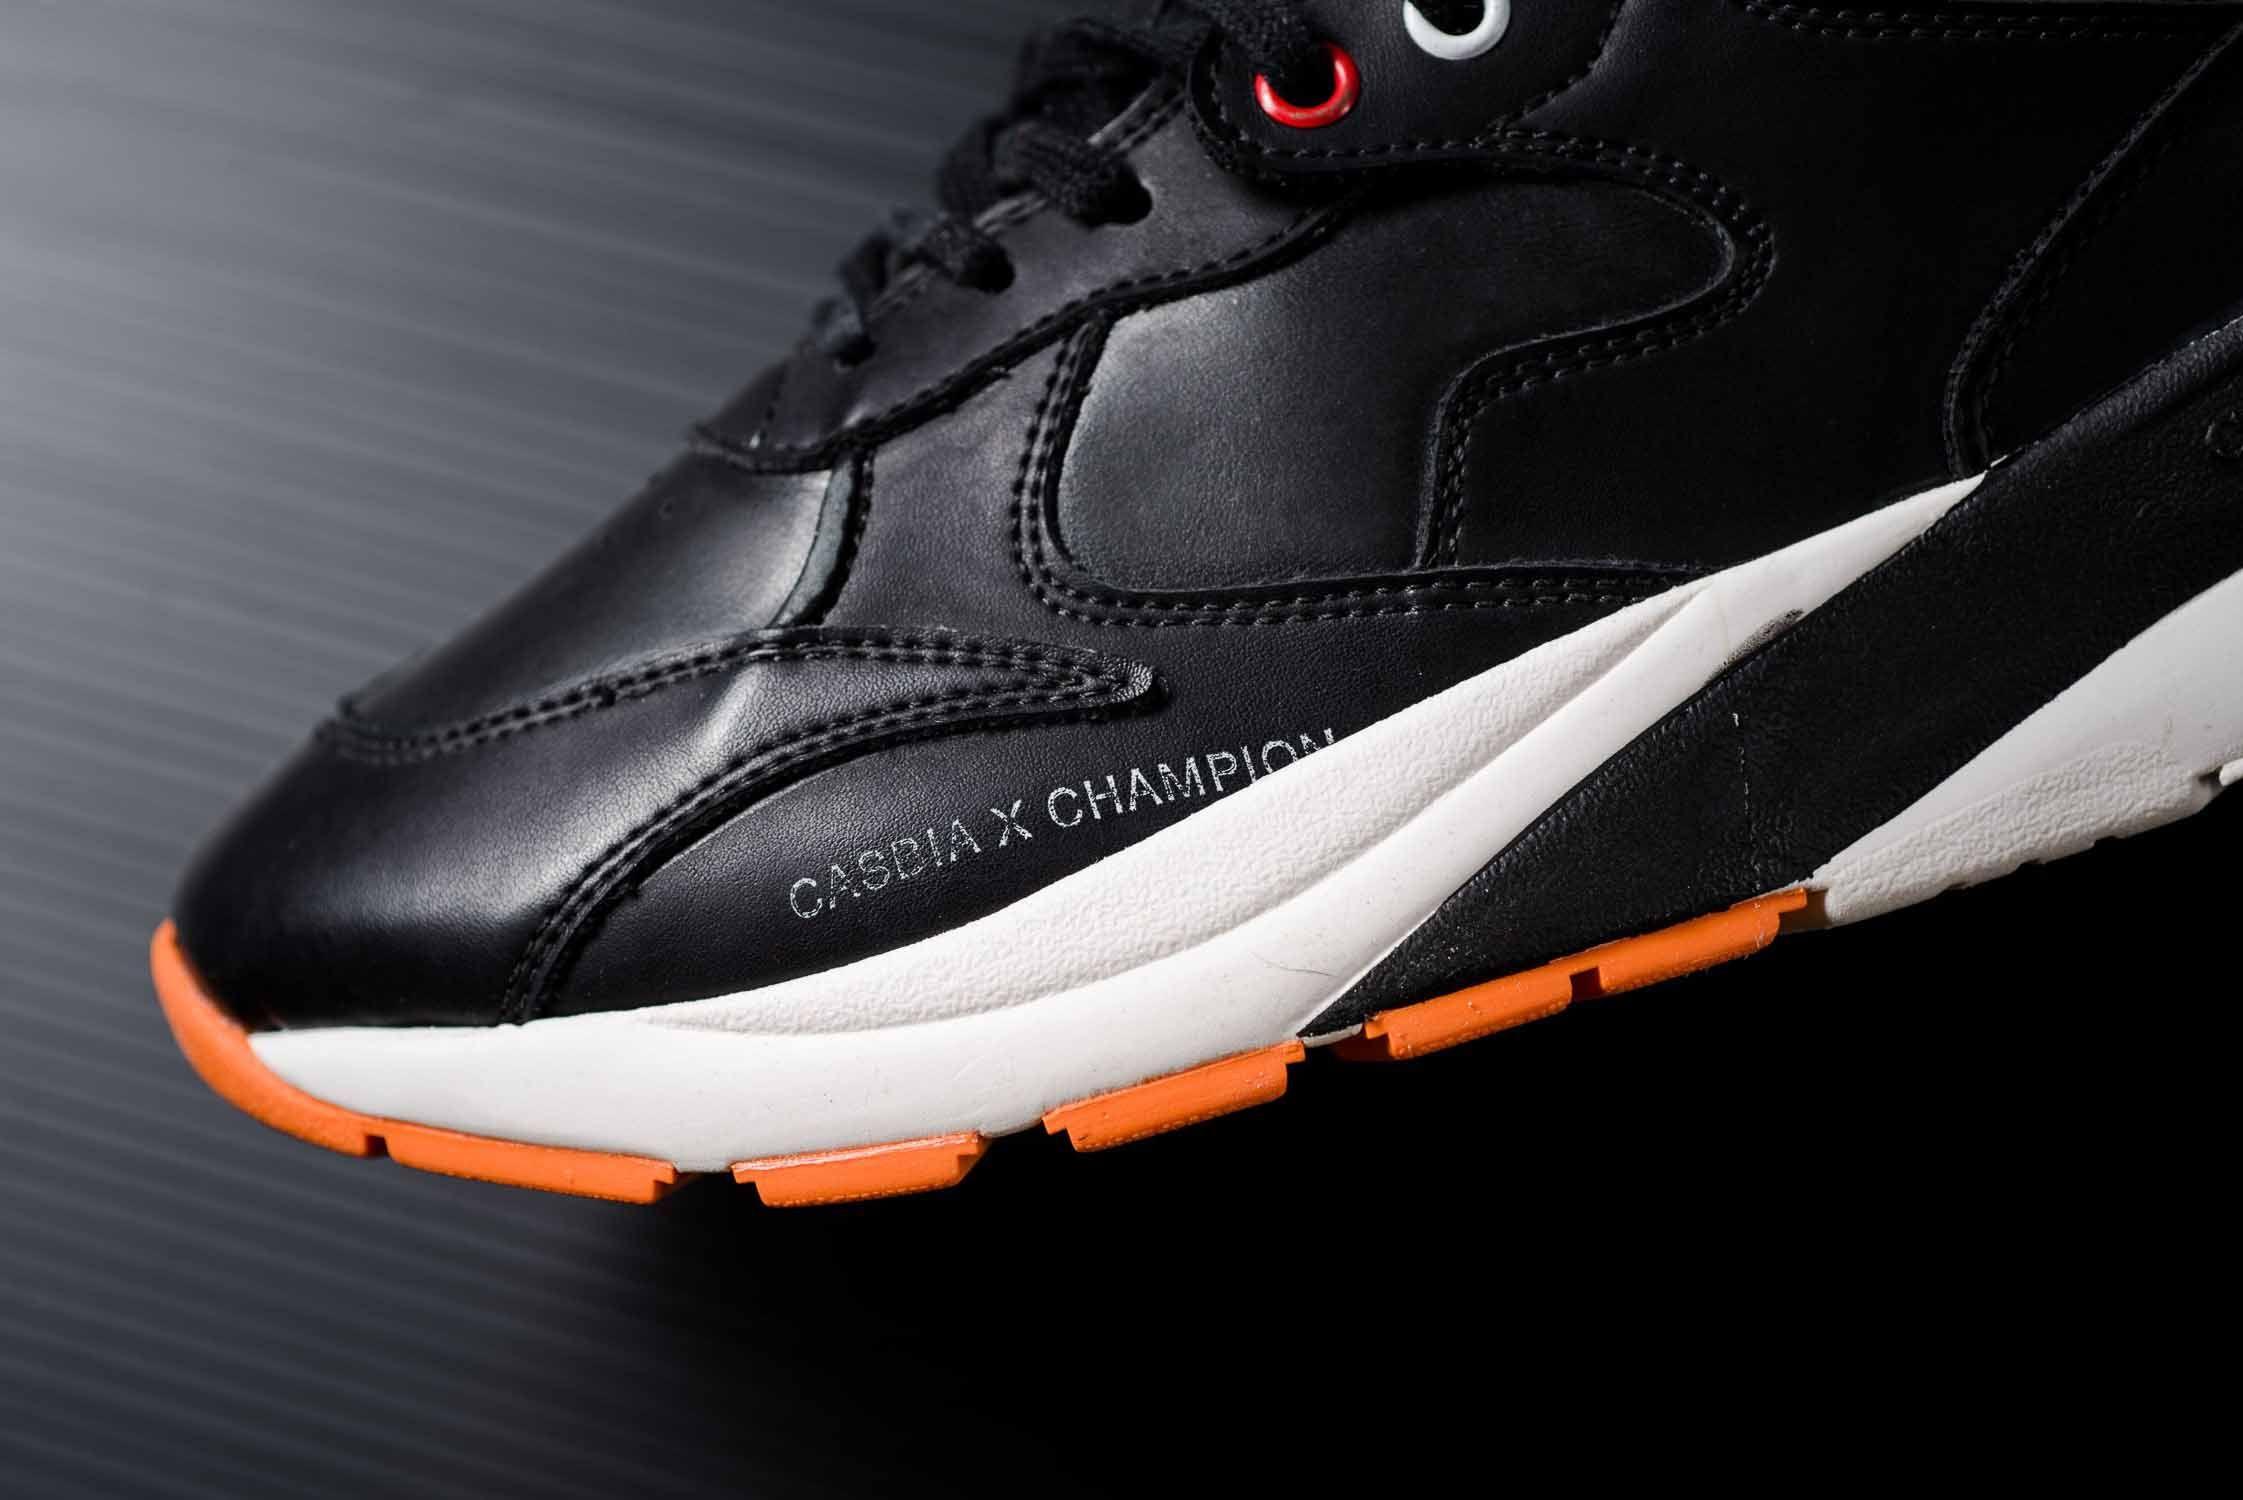 Casbia Champion Veloce Atl Sneaker Freaker Jpg13